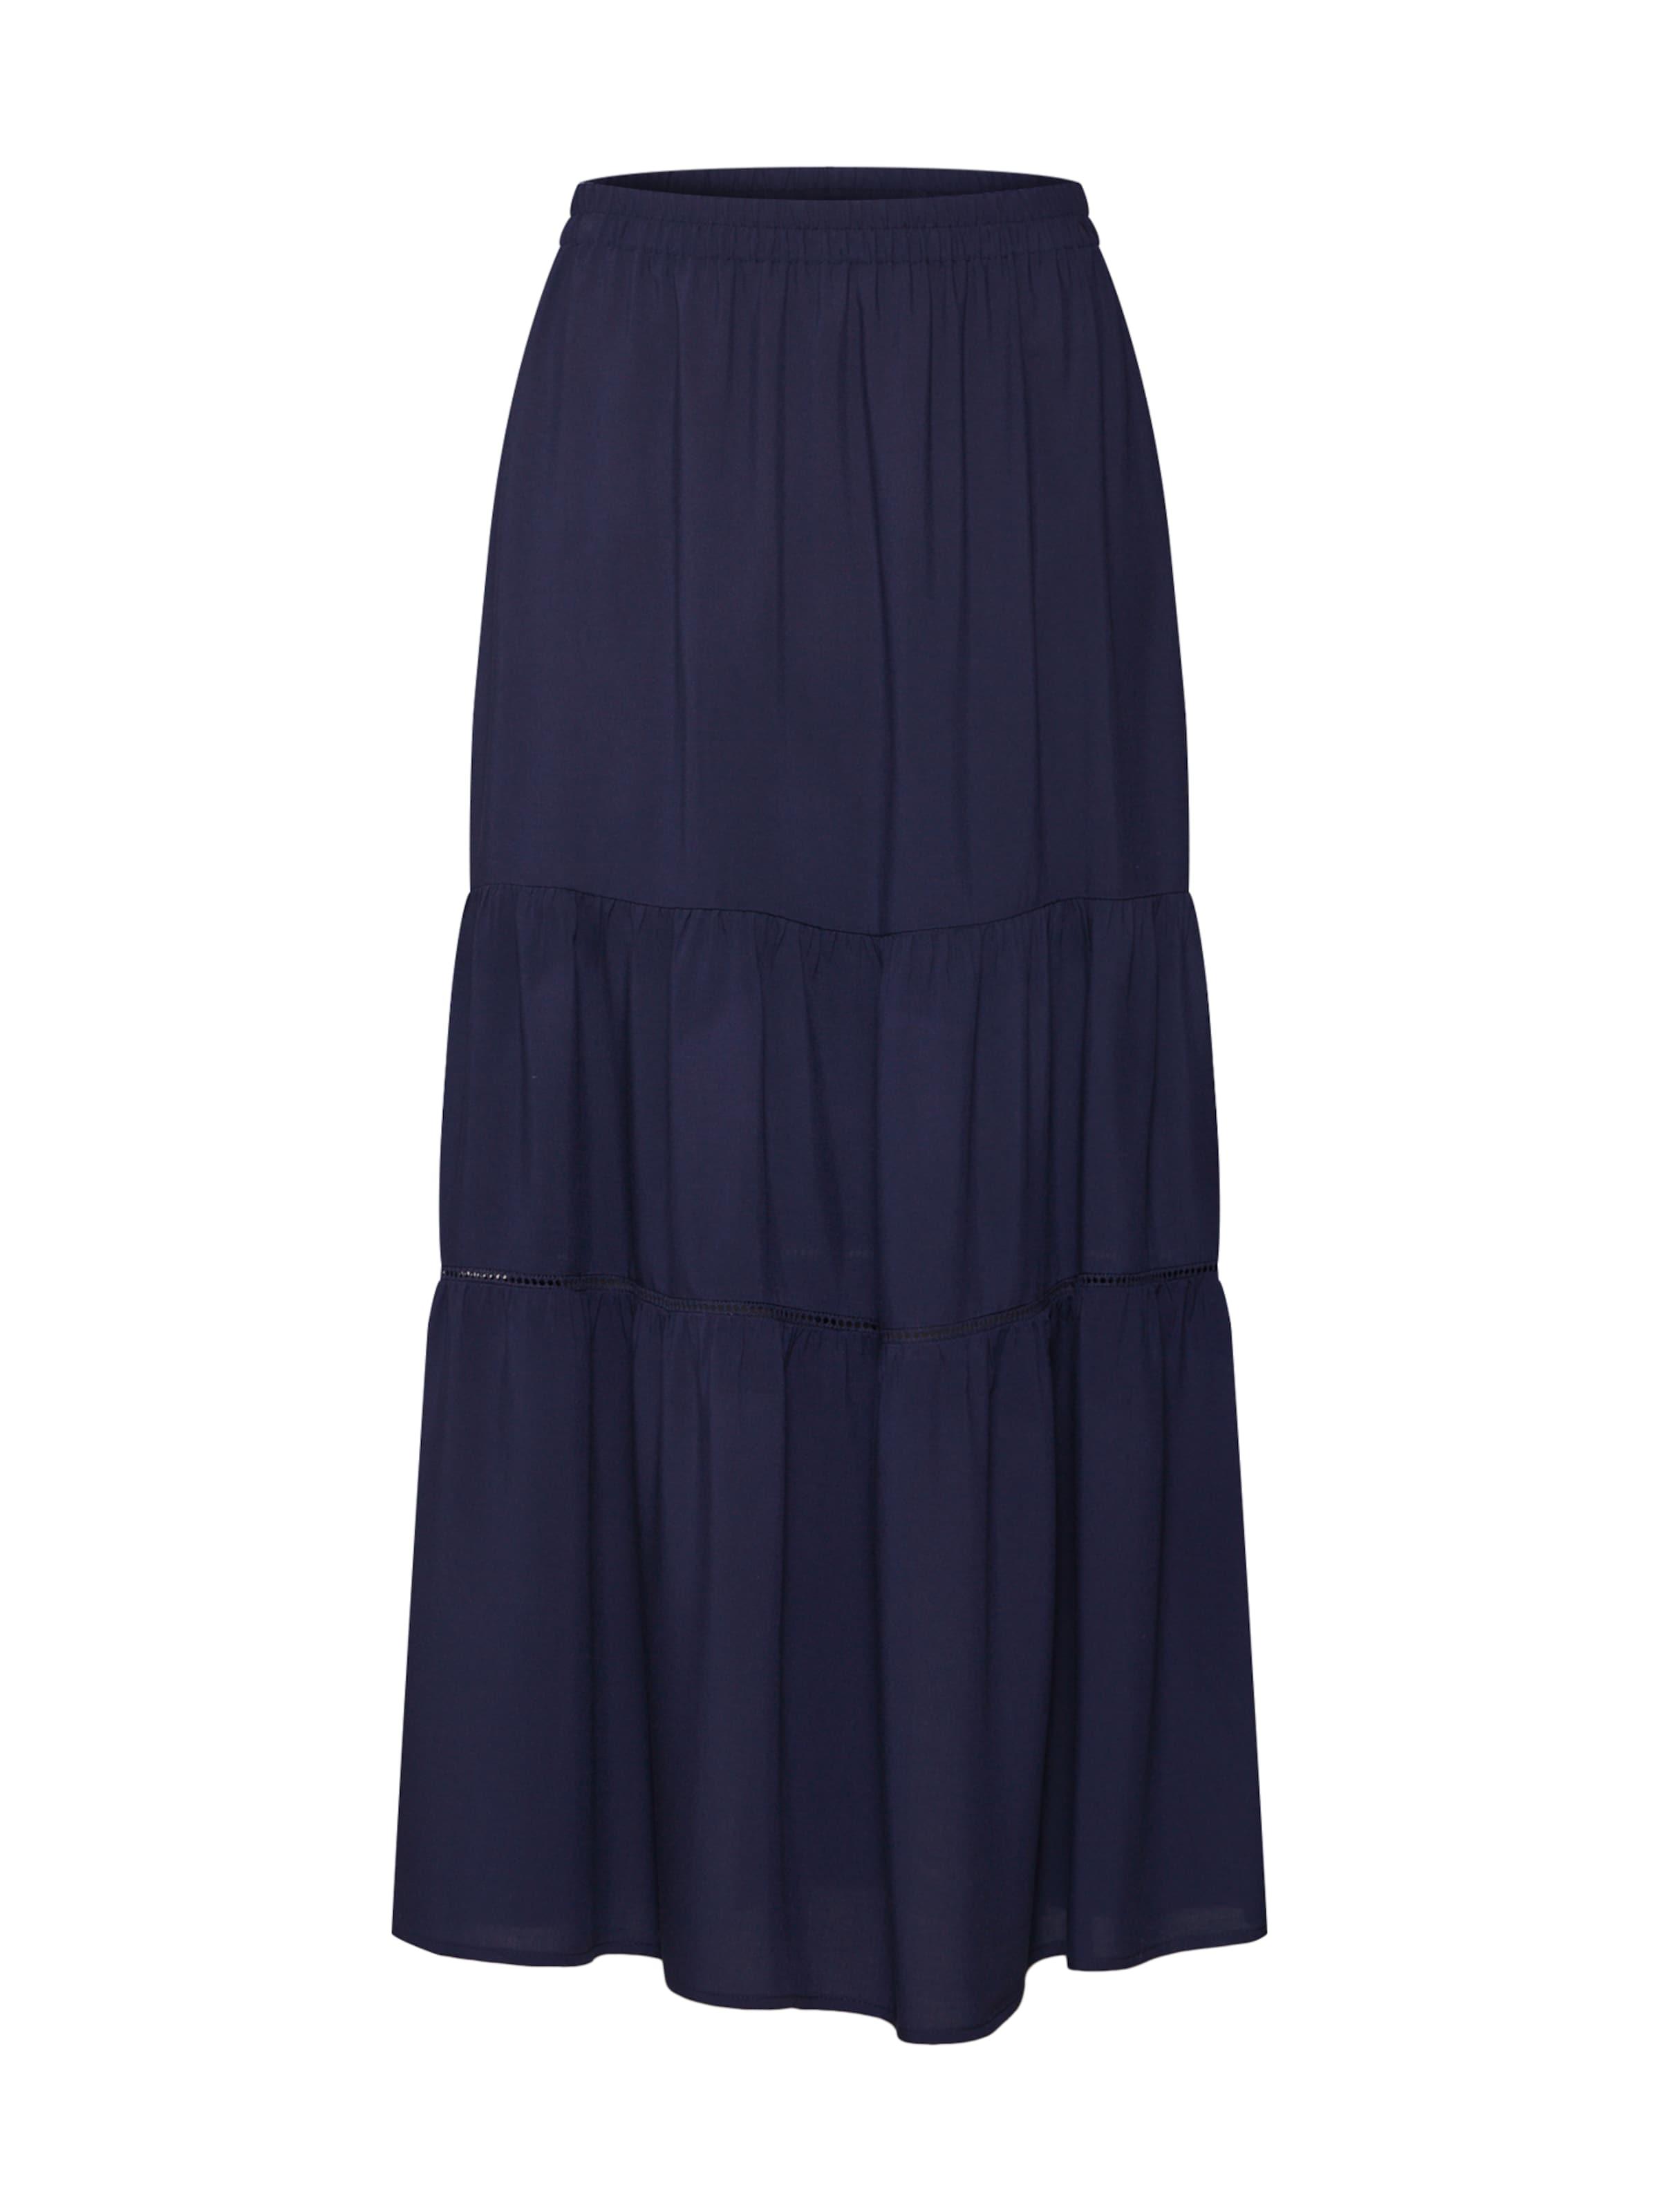 'jdykaya De Jupe En Wvn' Bleu Lace Yong Skirt Jacqueline Marine WI2EH9DY